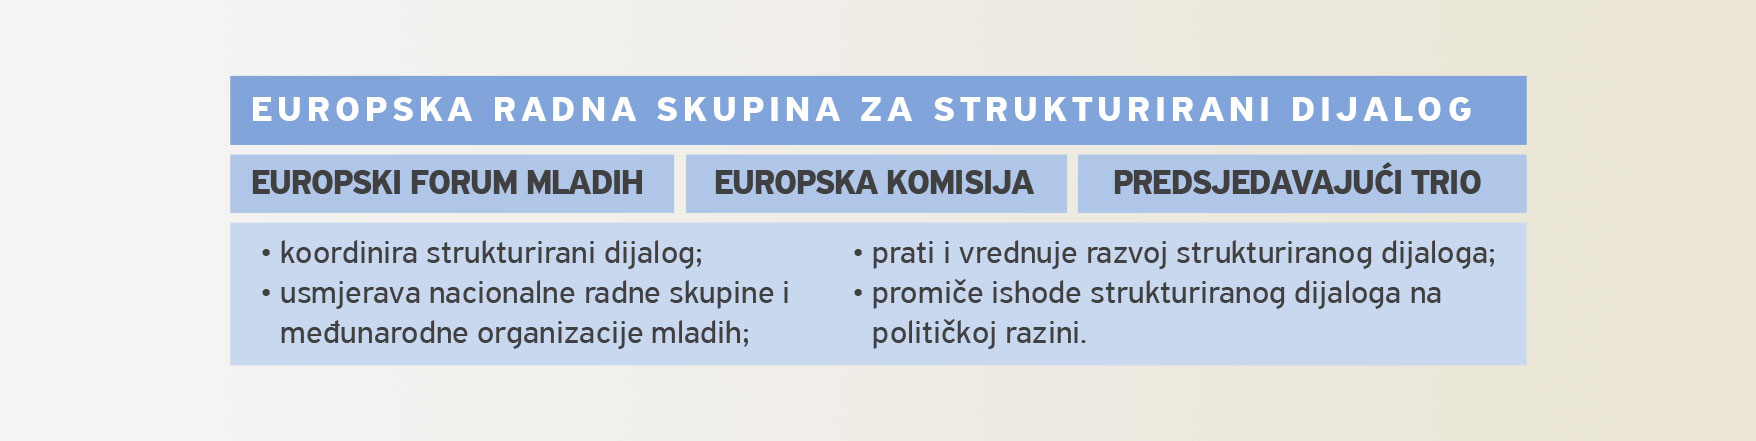 europska-radna-skupina